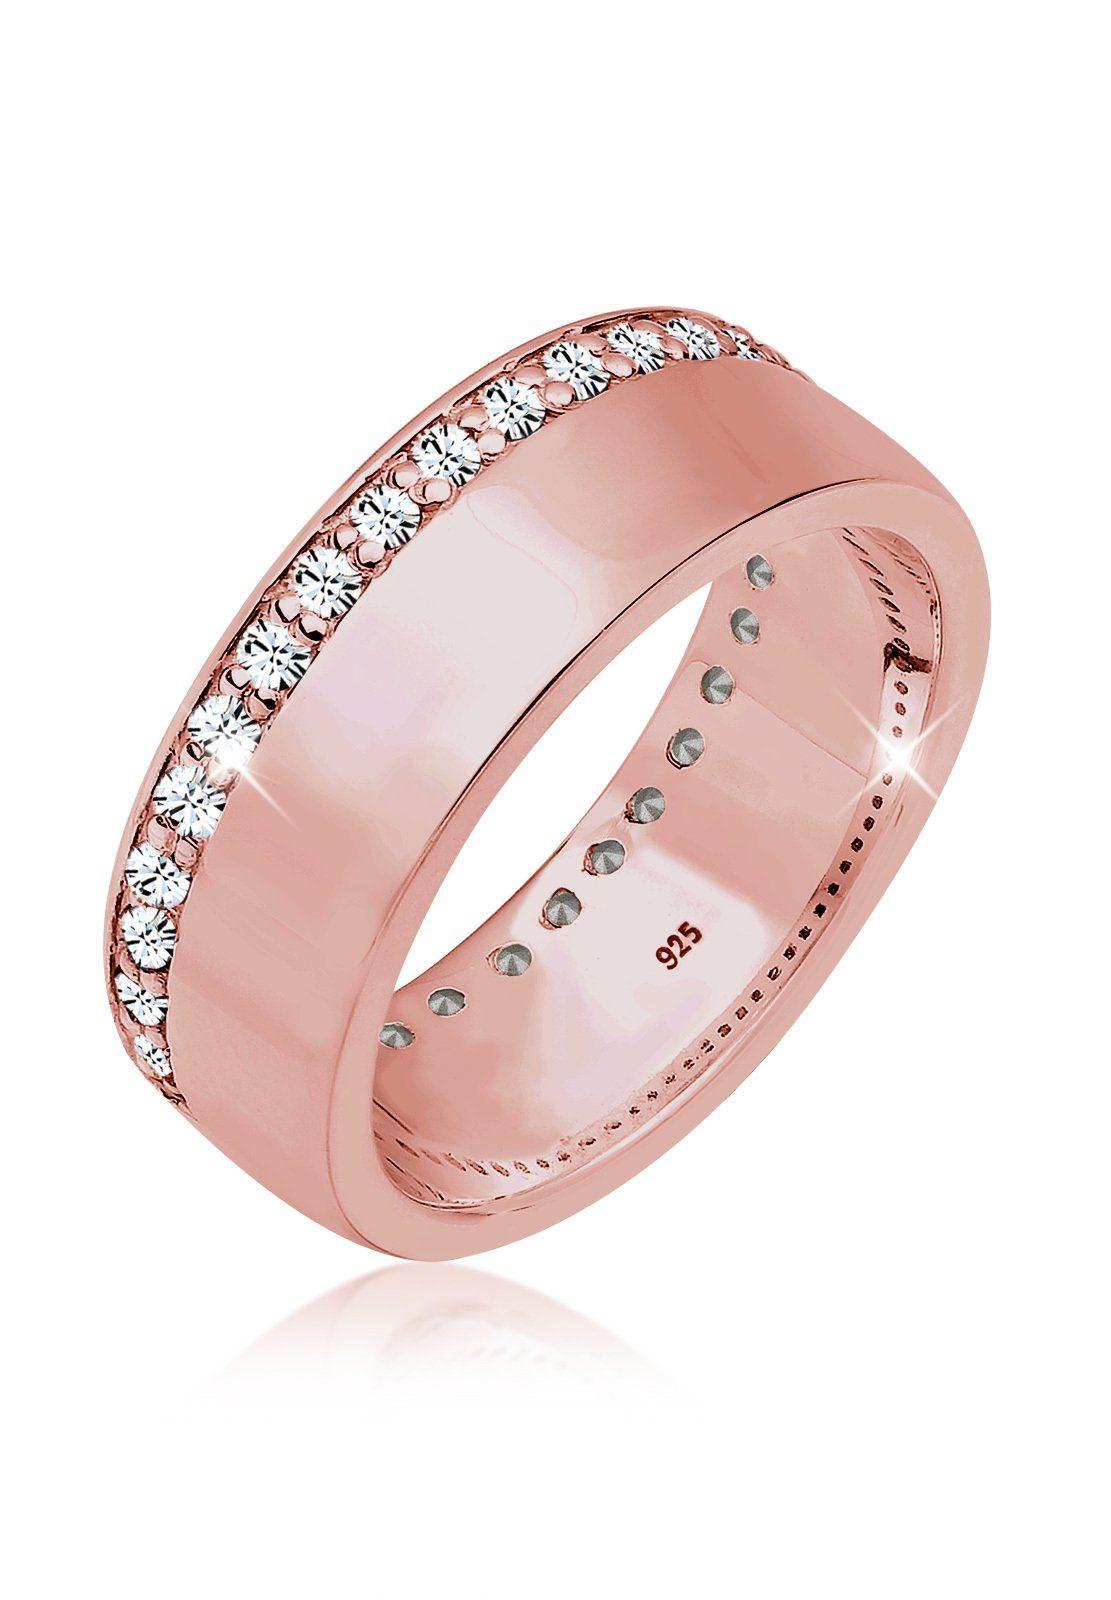 Elli Fingerring »Funkelnd Swarovski® Kristalle 925 Sterling Silber«, Bandring online kaufen   OTTO